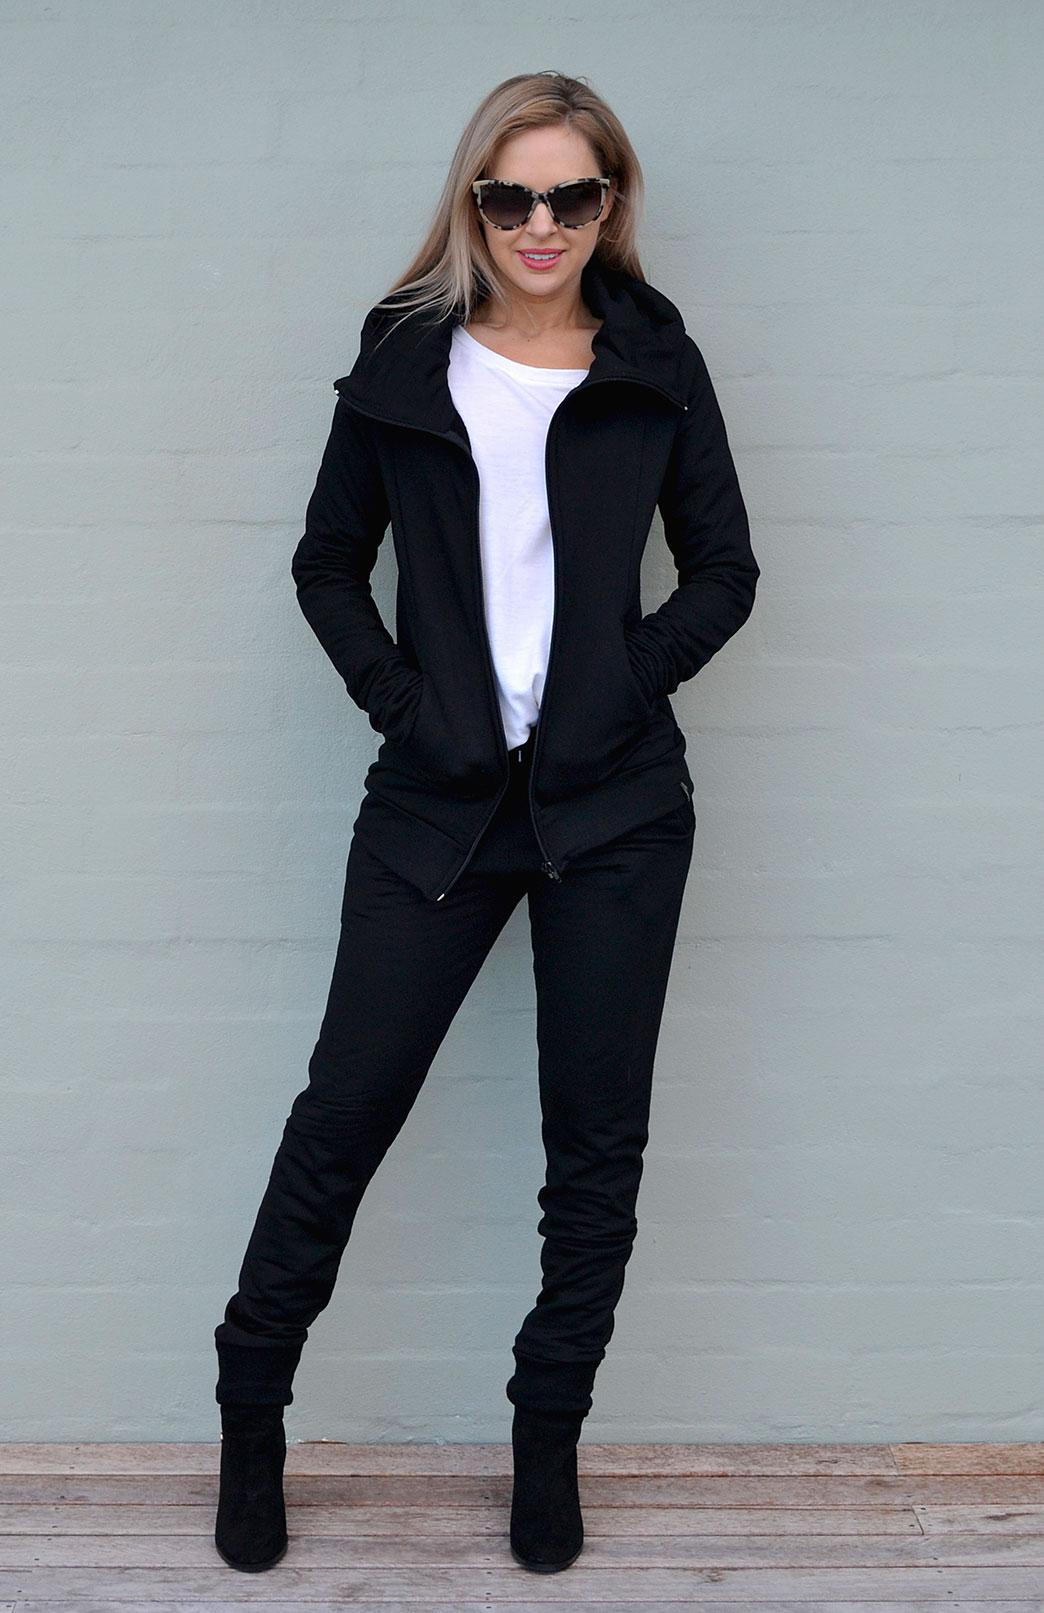 Fitted Fleece Hoody Jacket - Women's Black Wool Jacket with pockets and hood - Smitten Merino Tasmania Australia